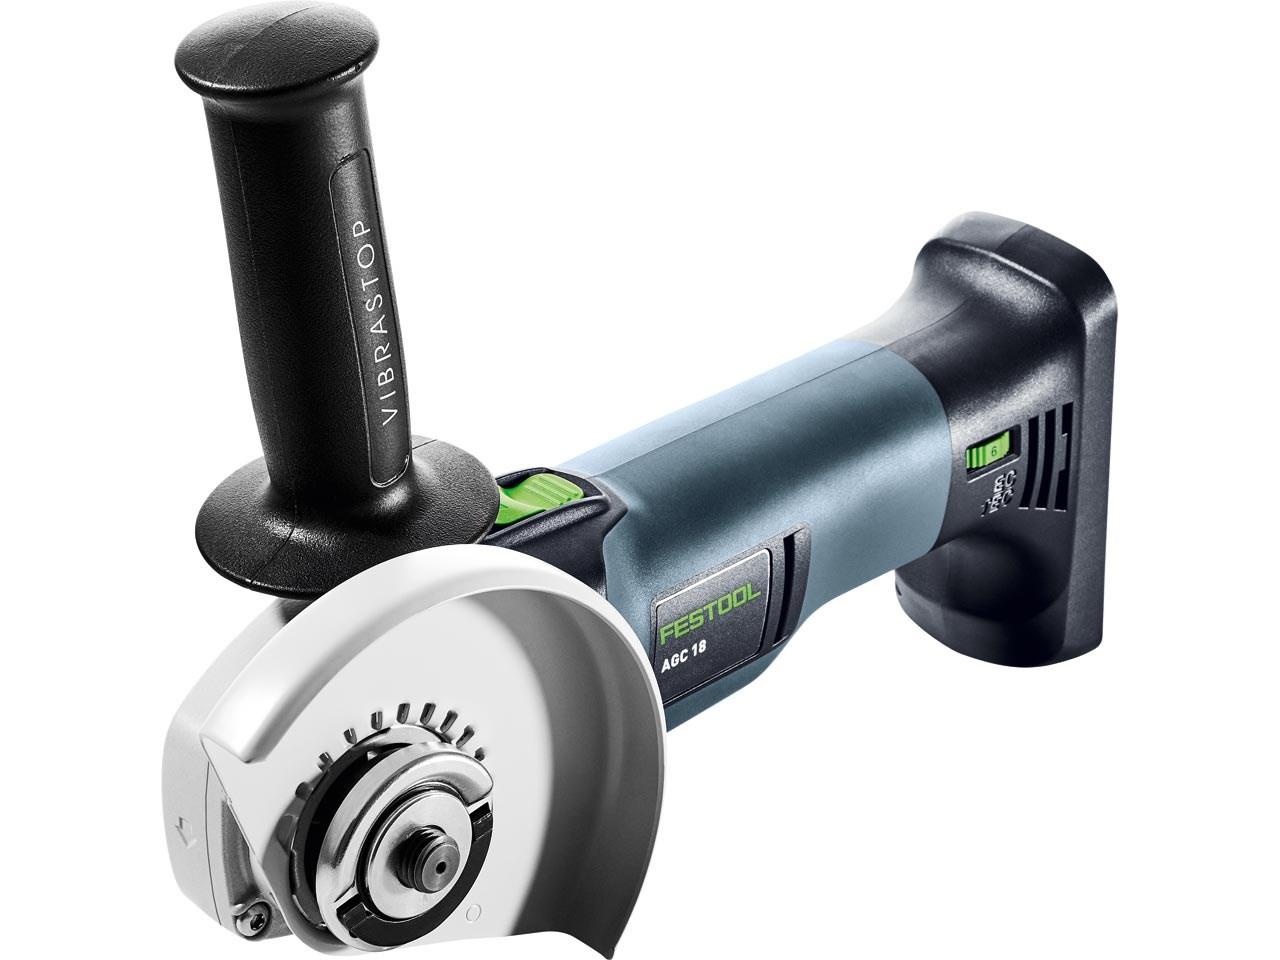 The new Festool AGC 18 V cordless angle grinder - Retail